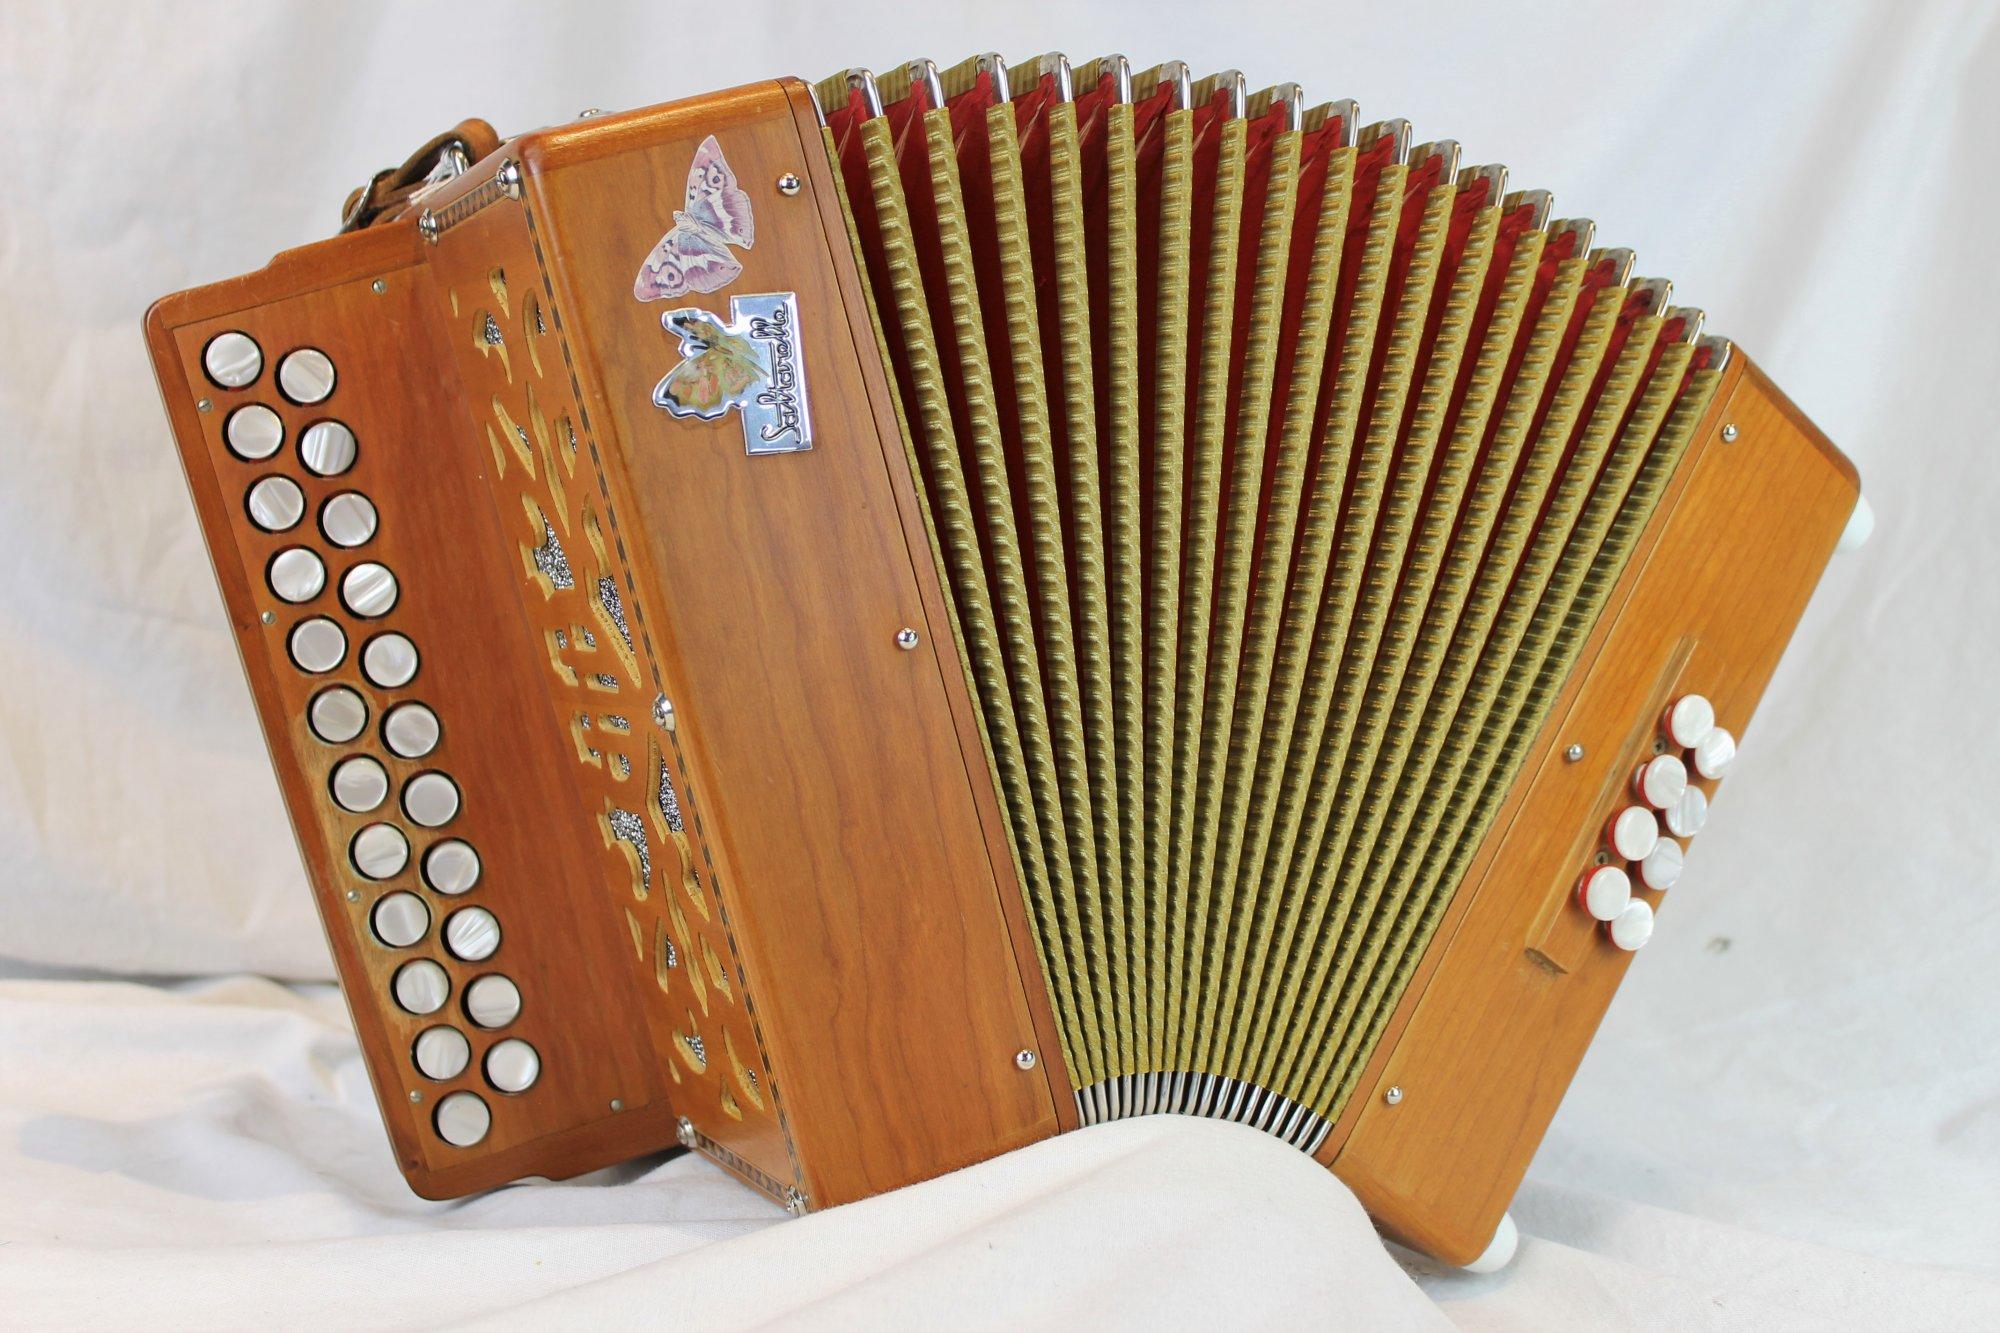 4893 - Cherry Saltarelle Irish Bouebe Diatonic Button Accordion BC 21 8